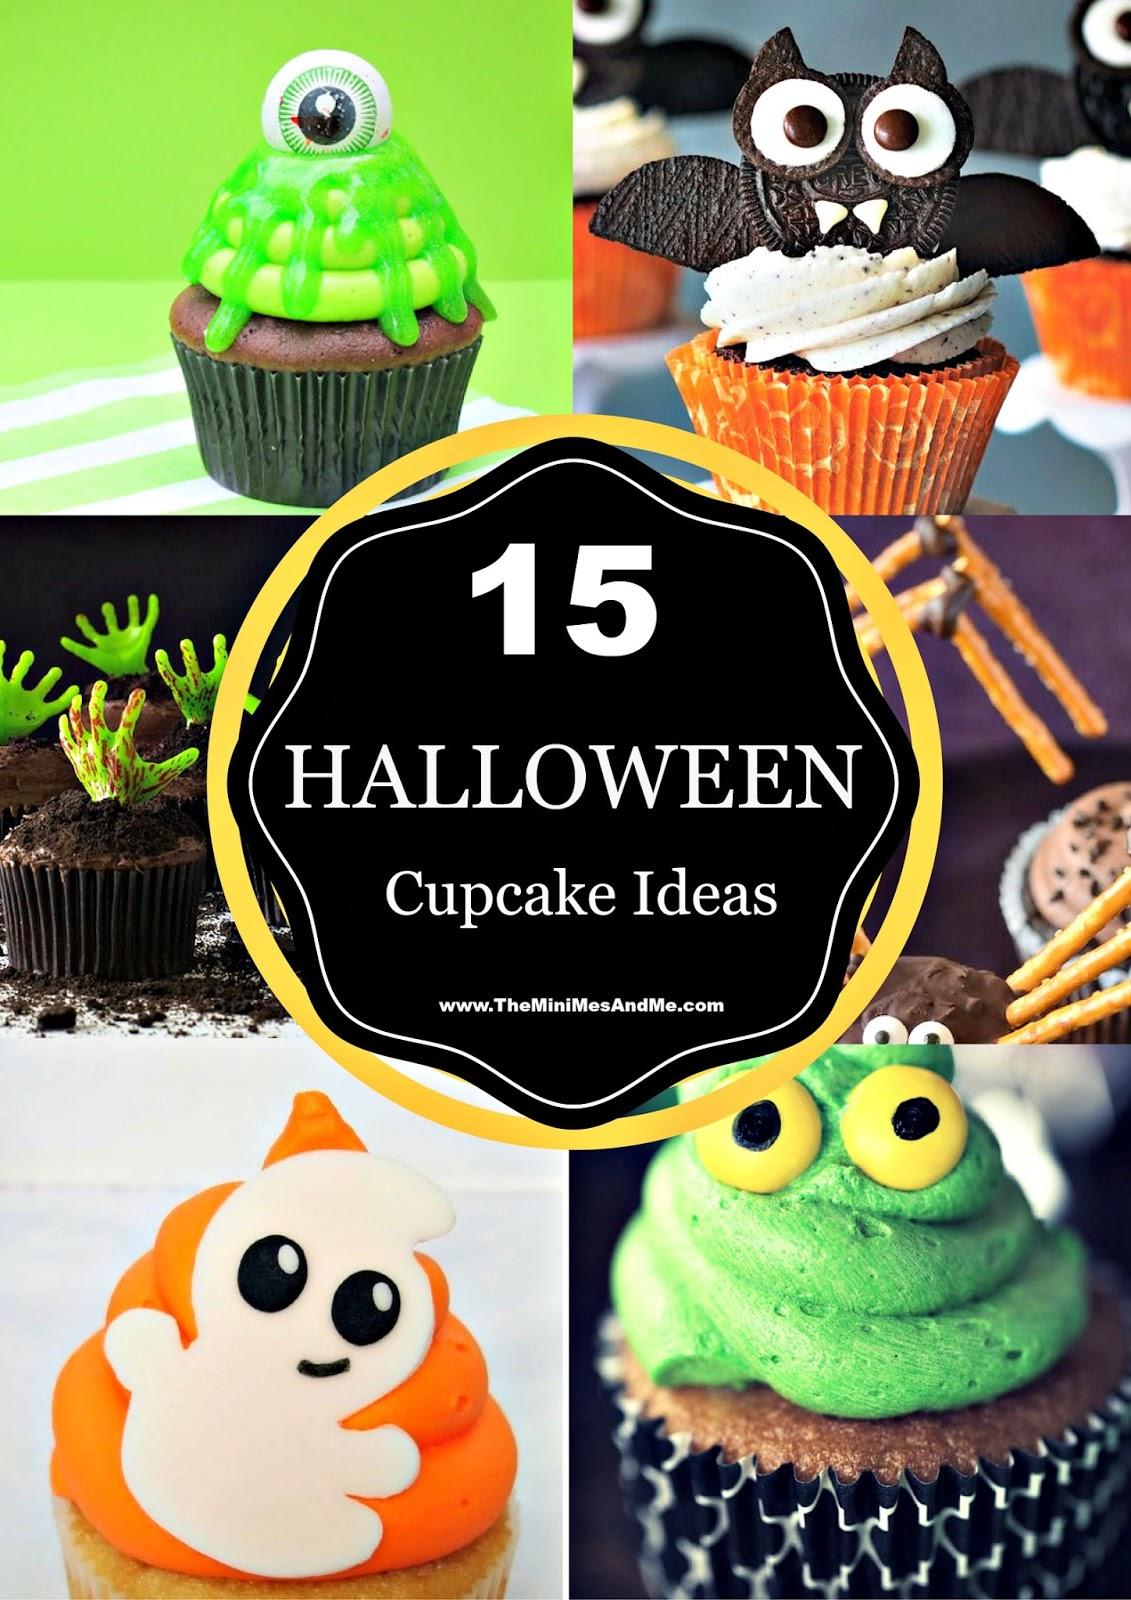 15 Spooktacular Halloween Cupcake Ideas The Mini Mes And Me